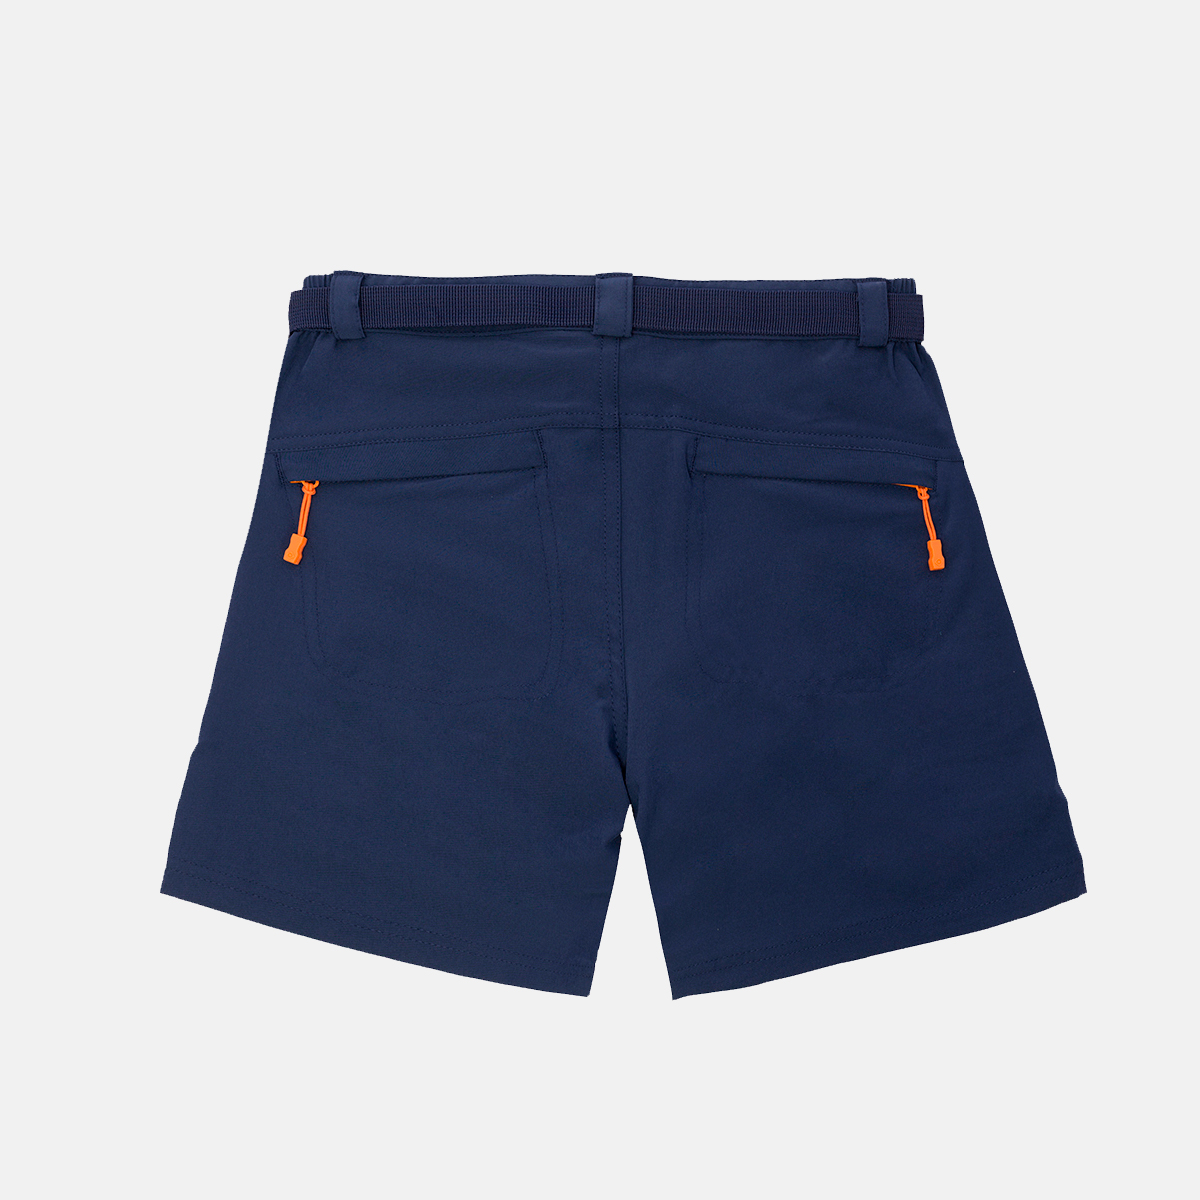 BEAR KIDS STRETCH SHORT PANT BLUE